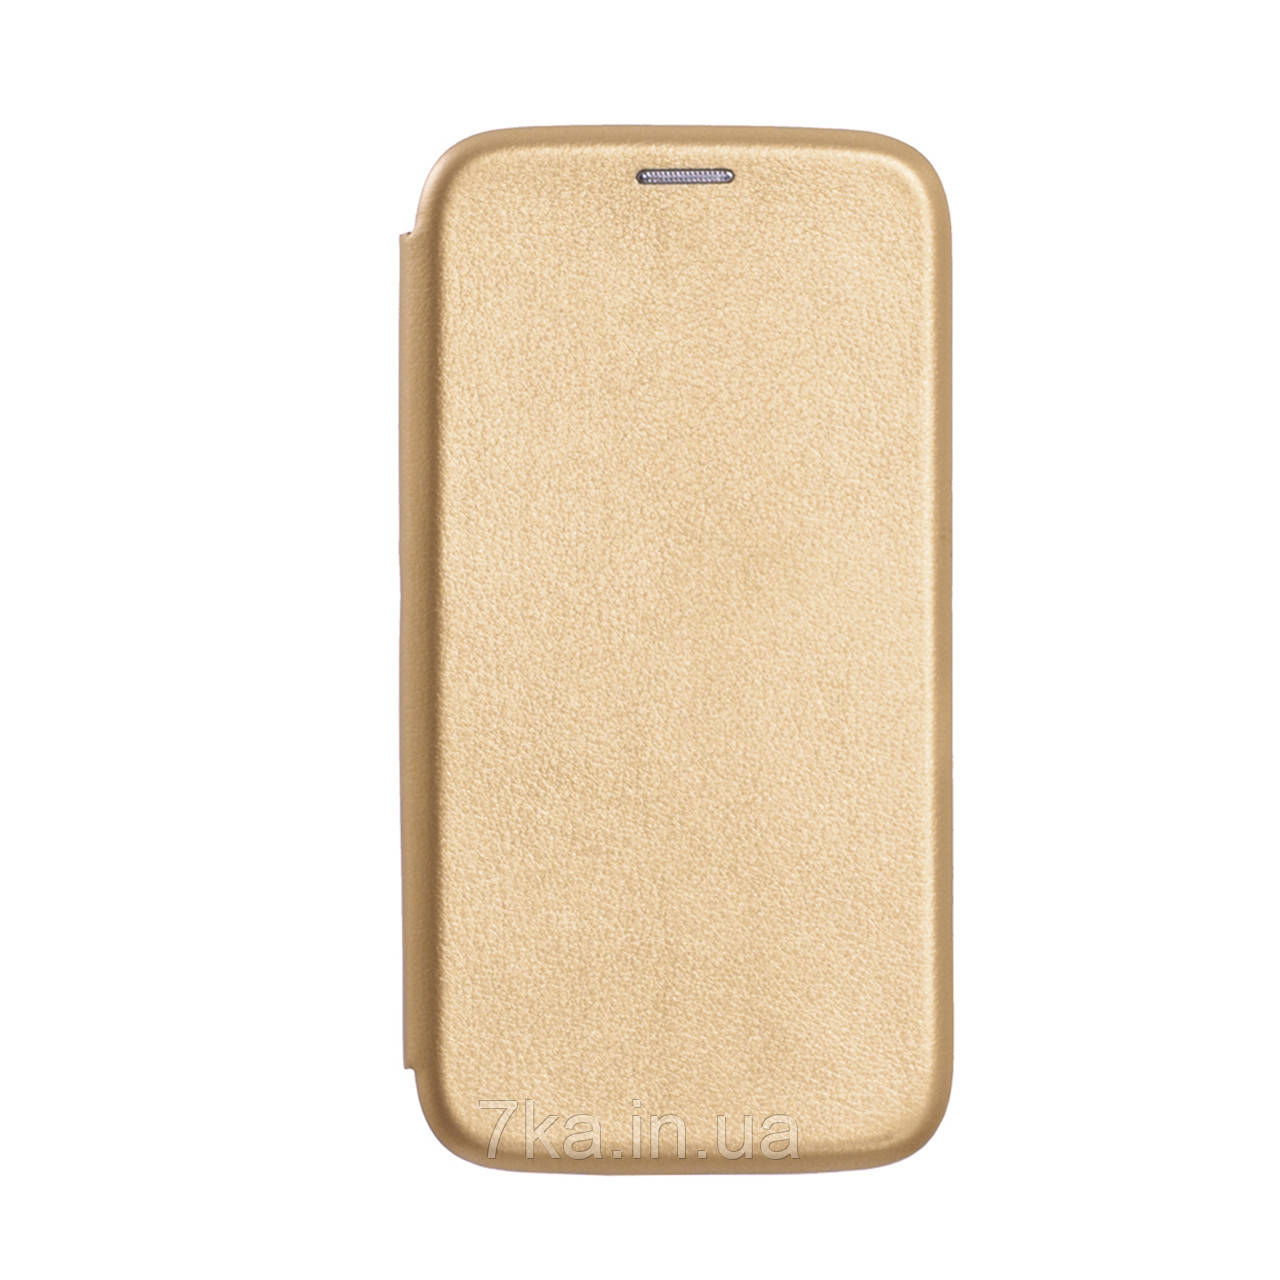 Чехол книжка Premium Leather на Meizu M6 золотой